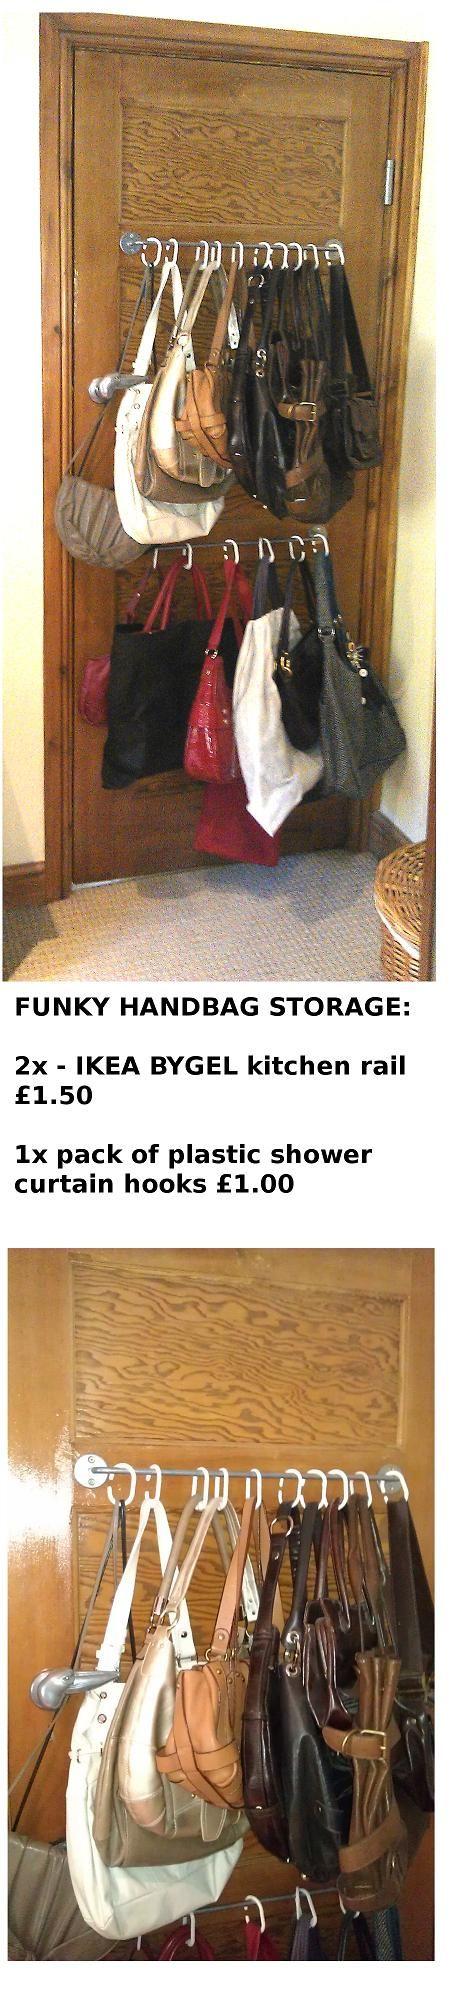 Funky handbag storage for under 5 tips pinterest - Organizadores hogar ...